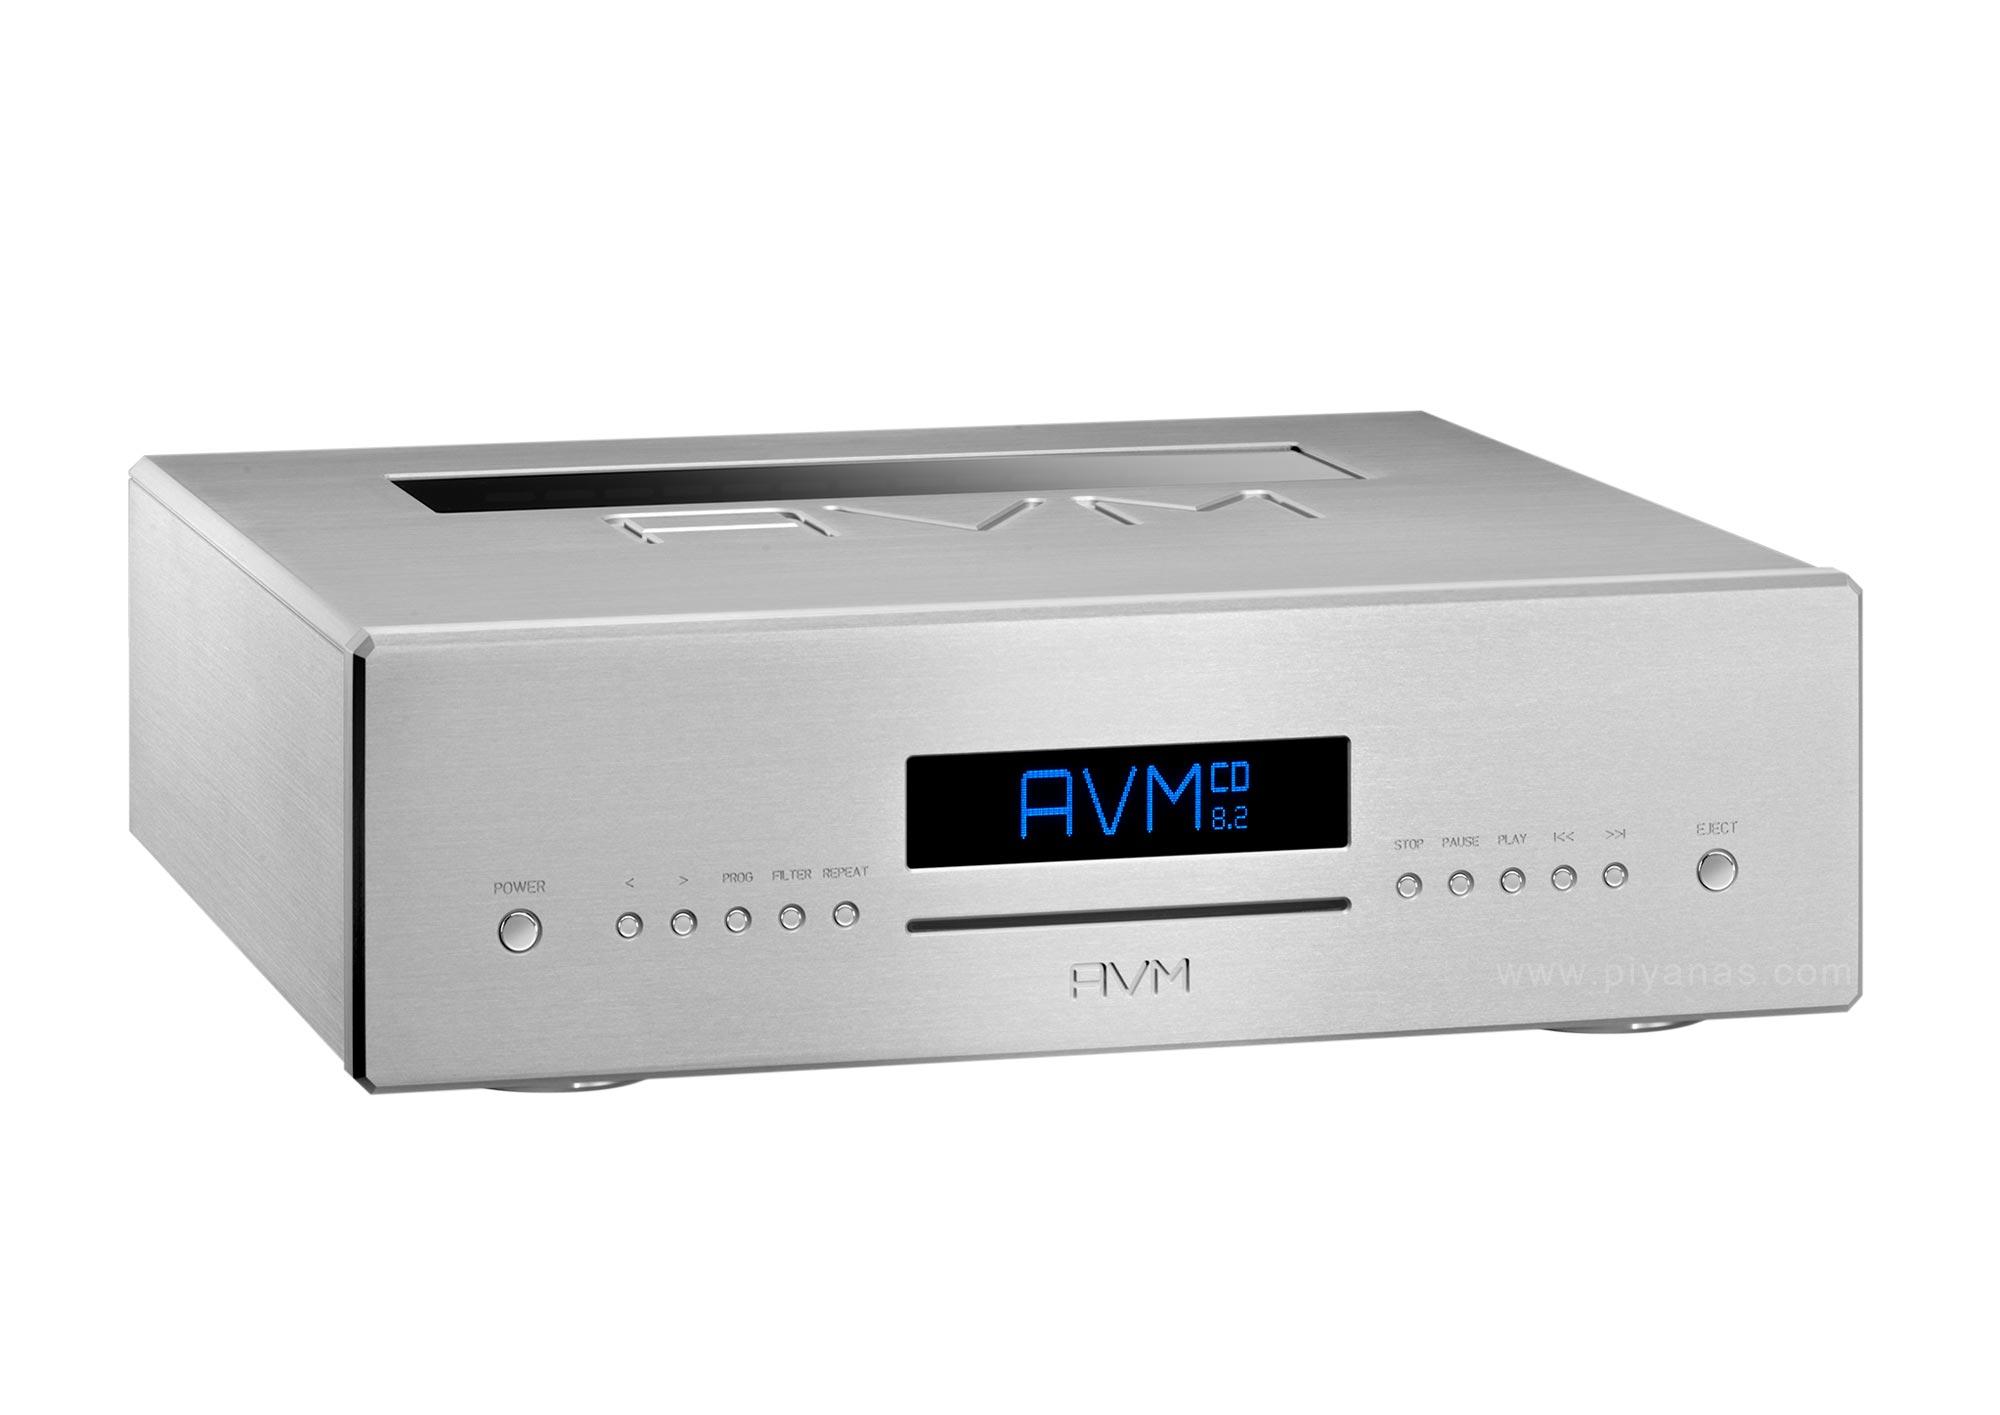 CD 8.2 (Silver) รวมรีโมท RC3